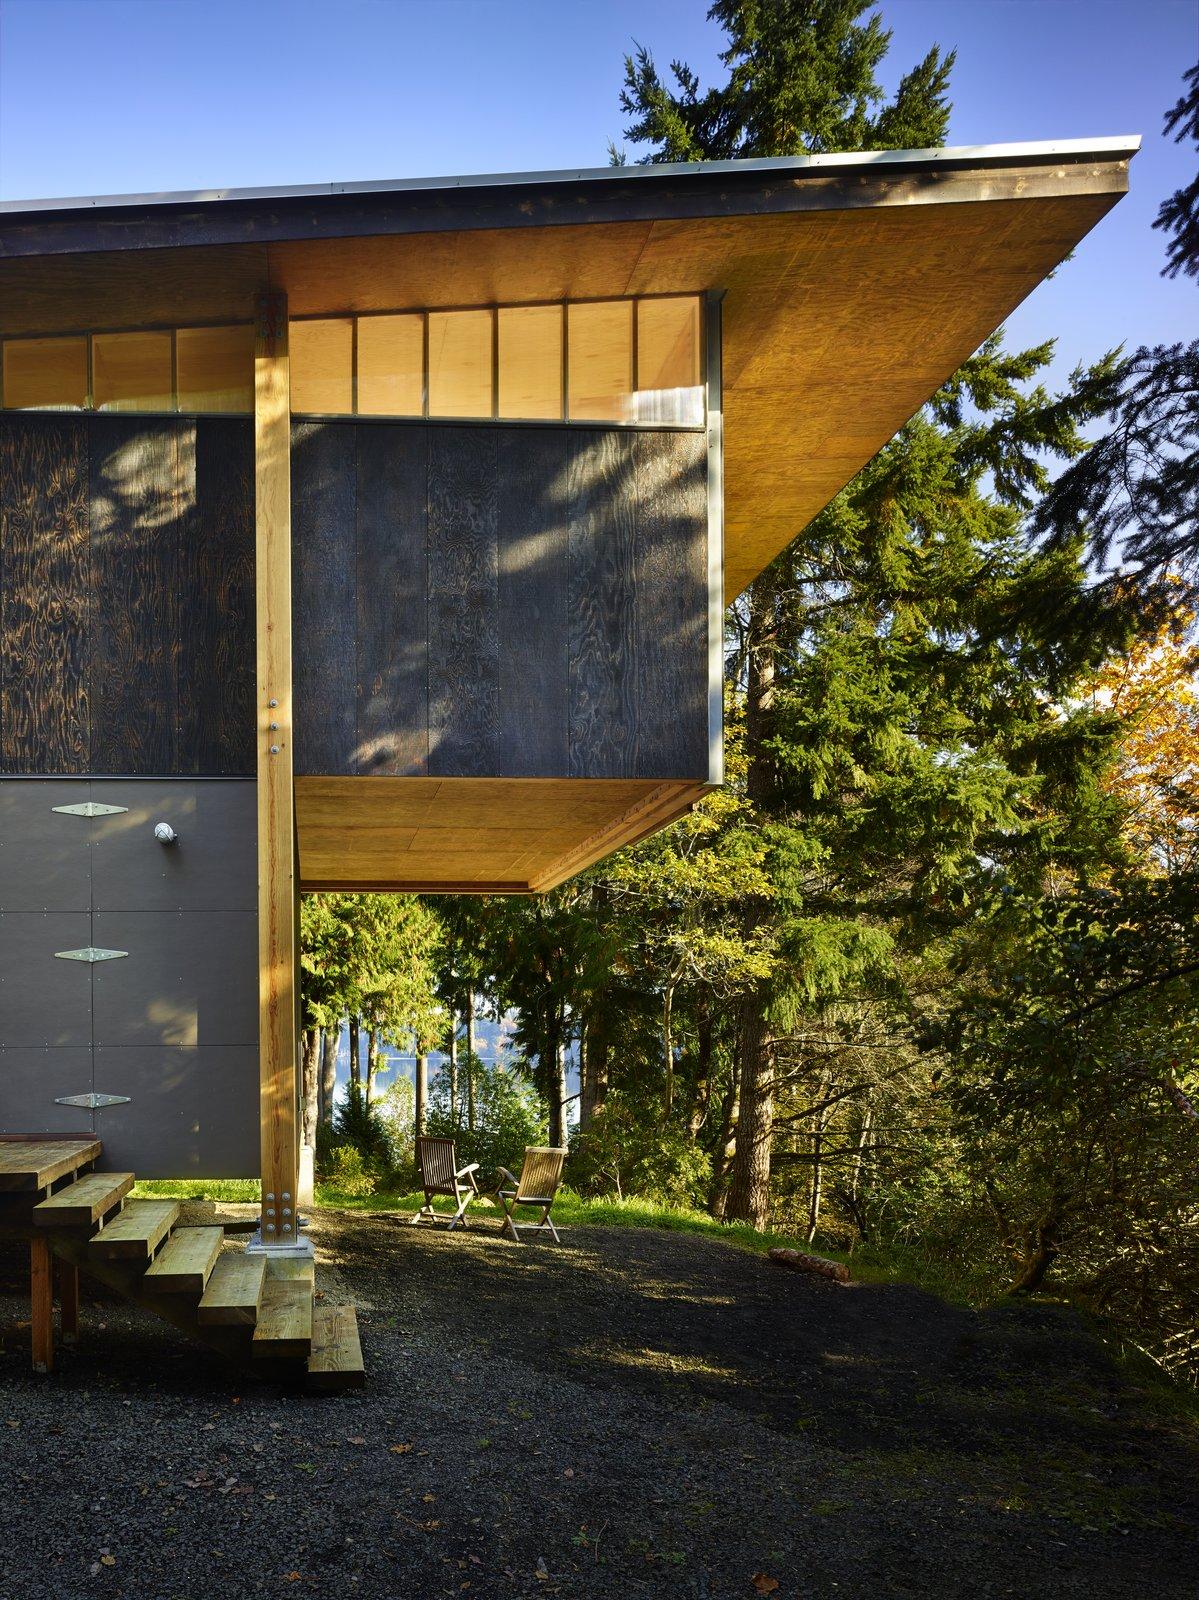 Reclaimed Materials Make Up This Artist Studio in Washington